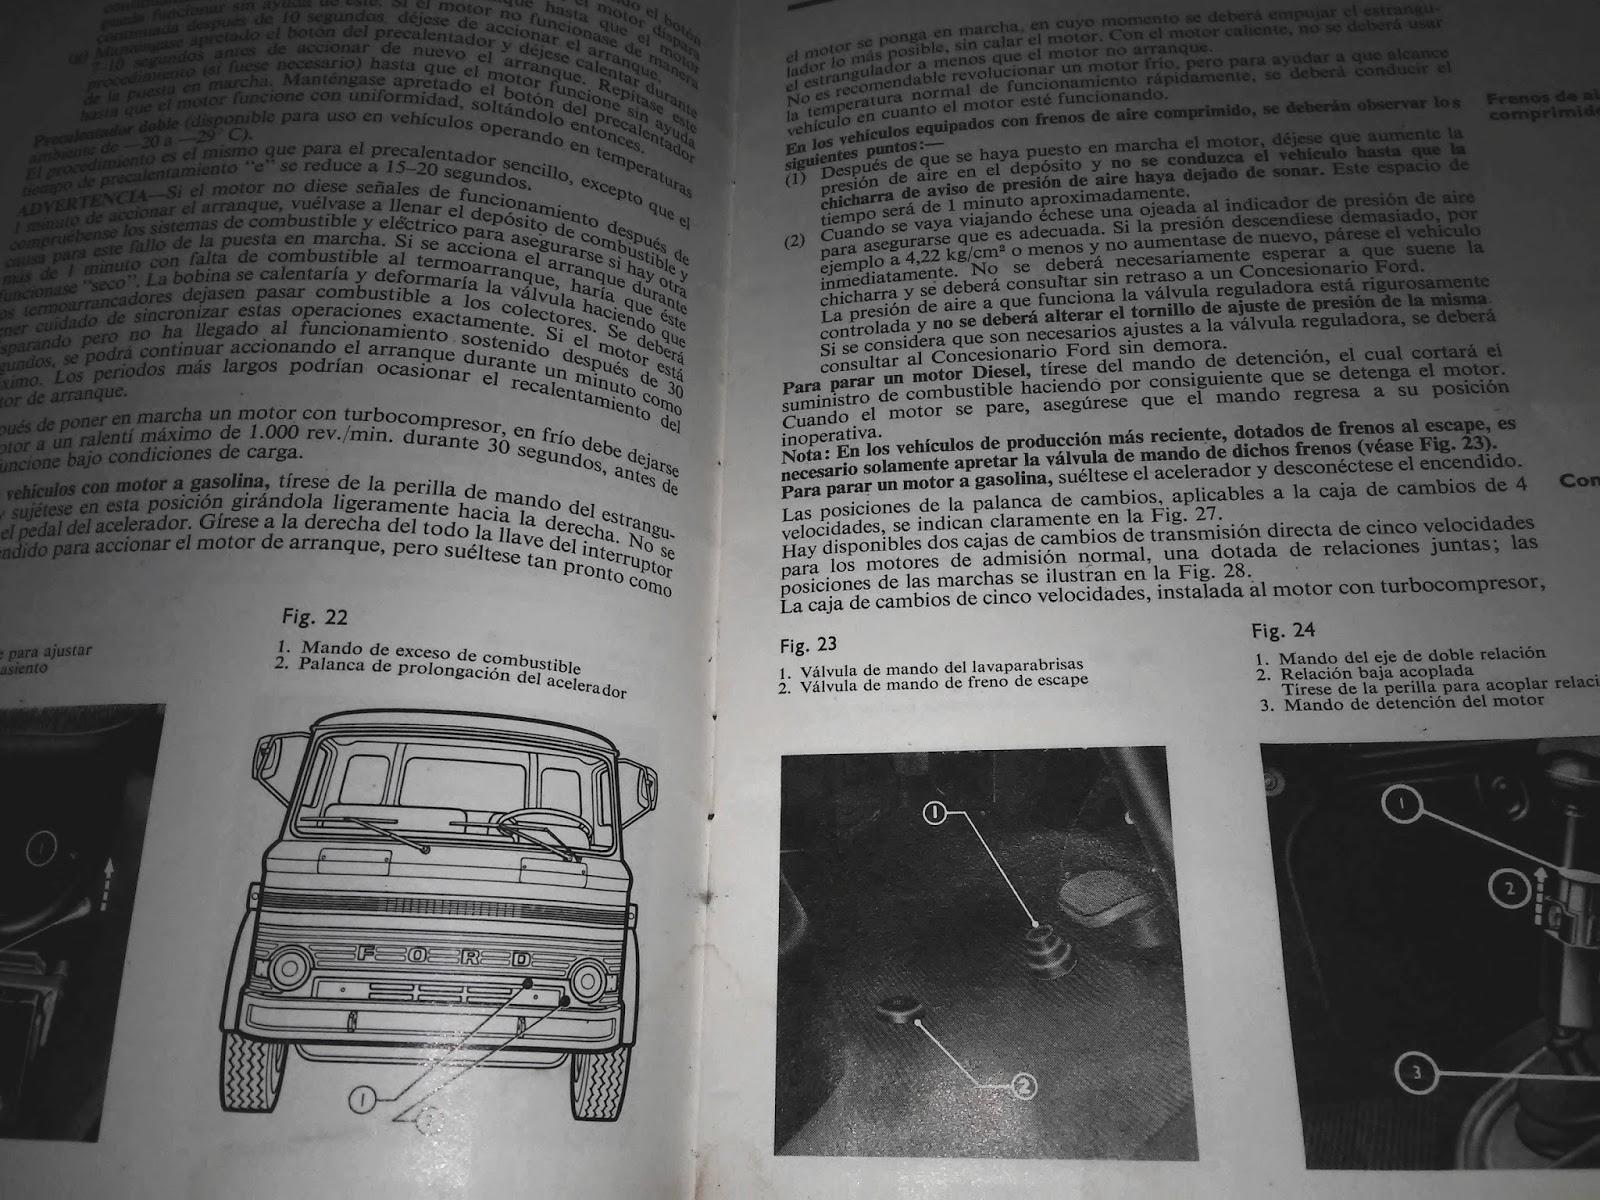 Manual De Usuario Original Camiones Ford Serie D En Español tel 094 24 44 11